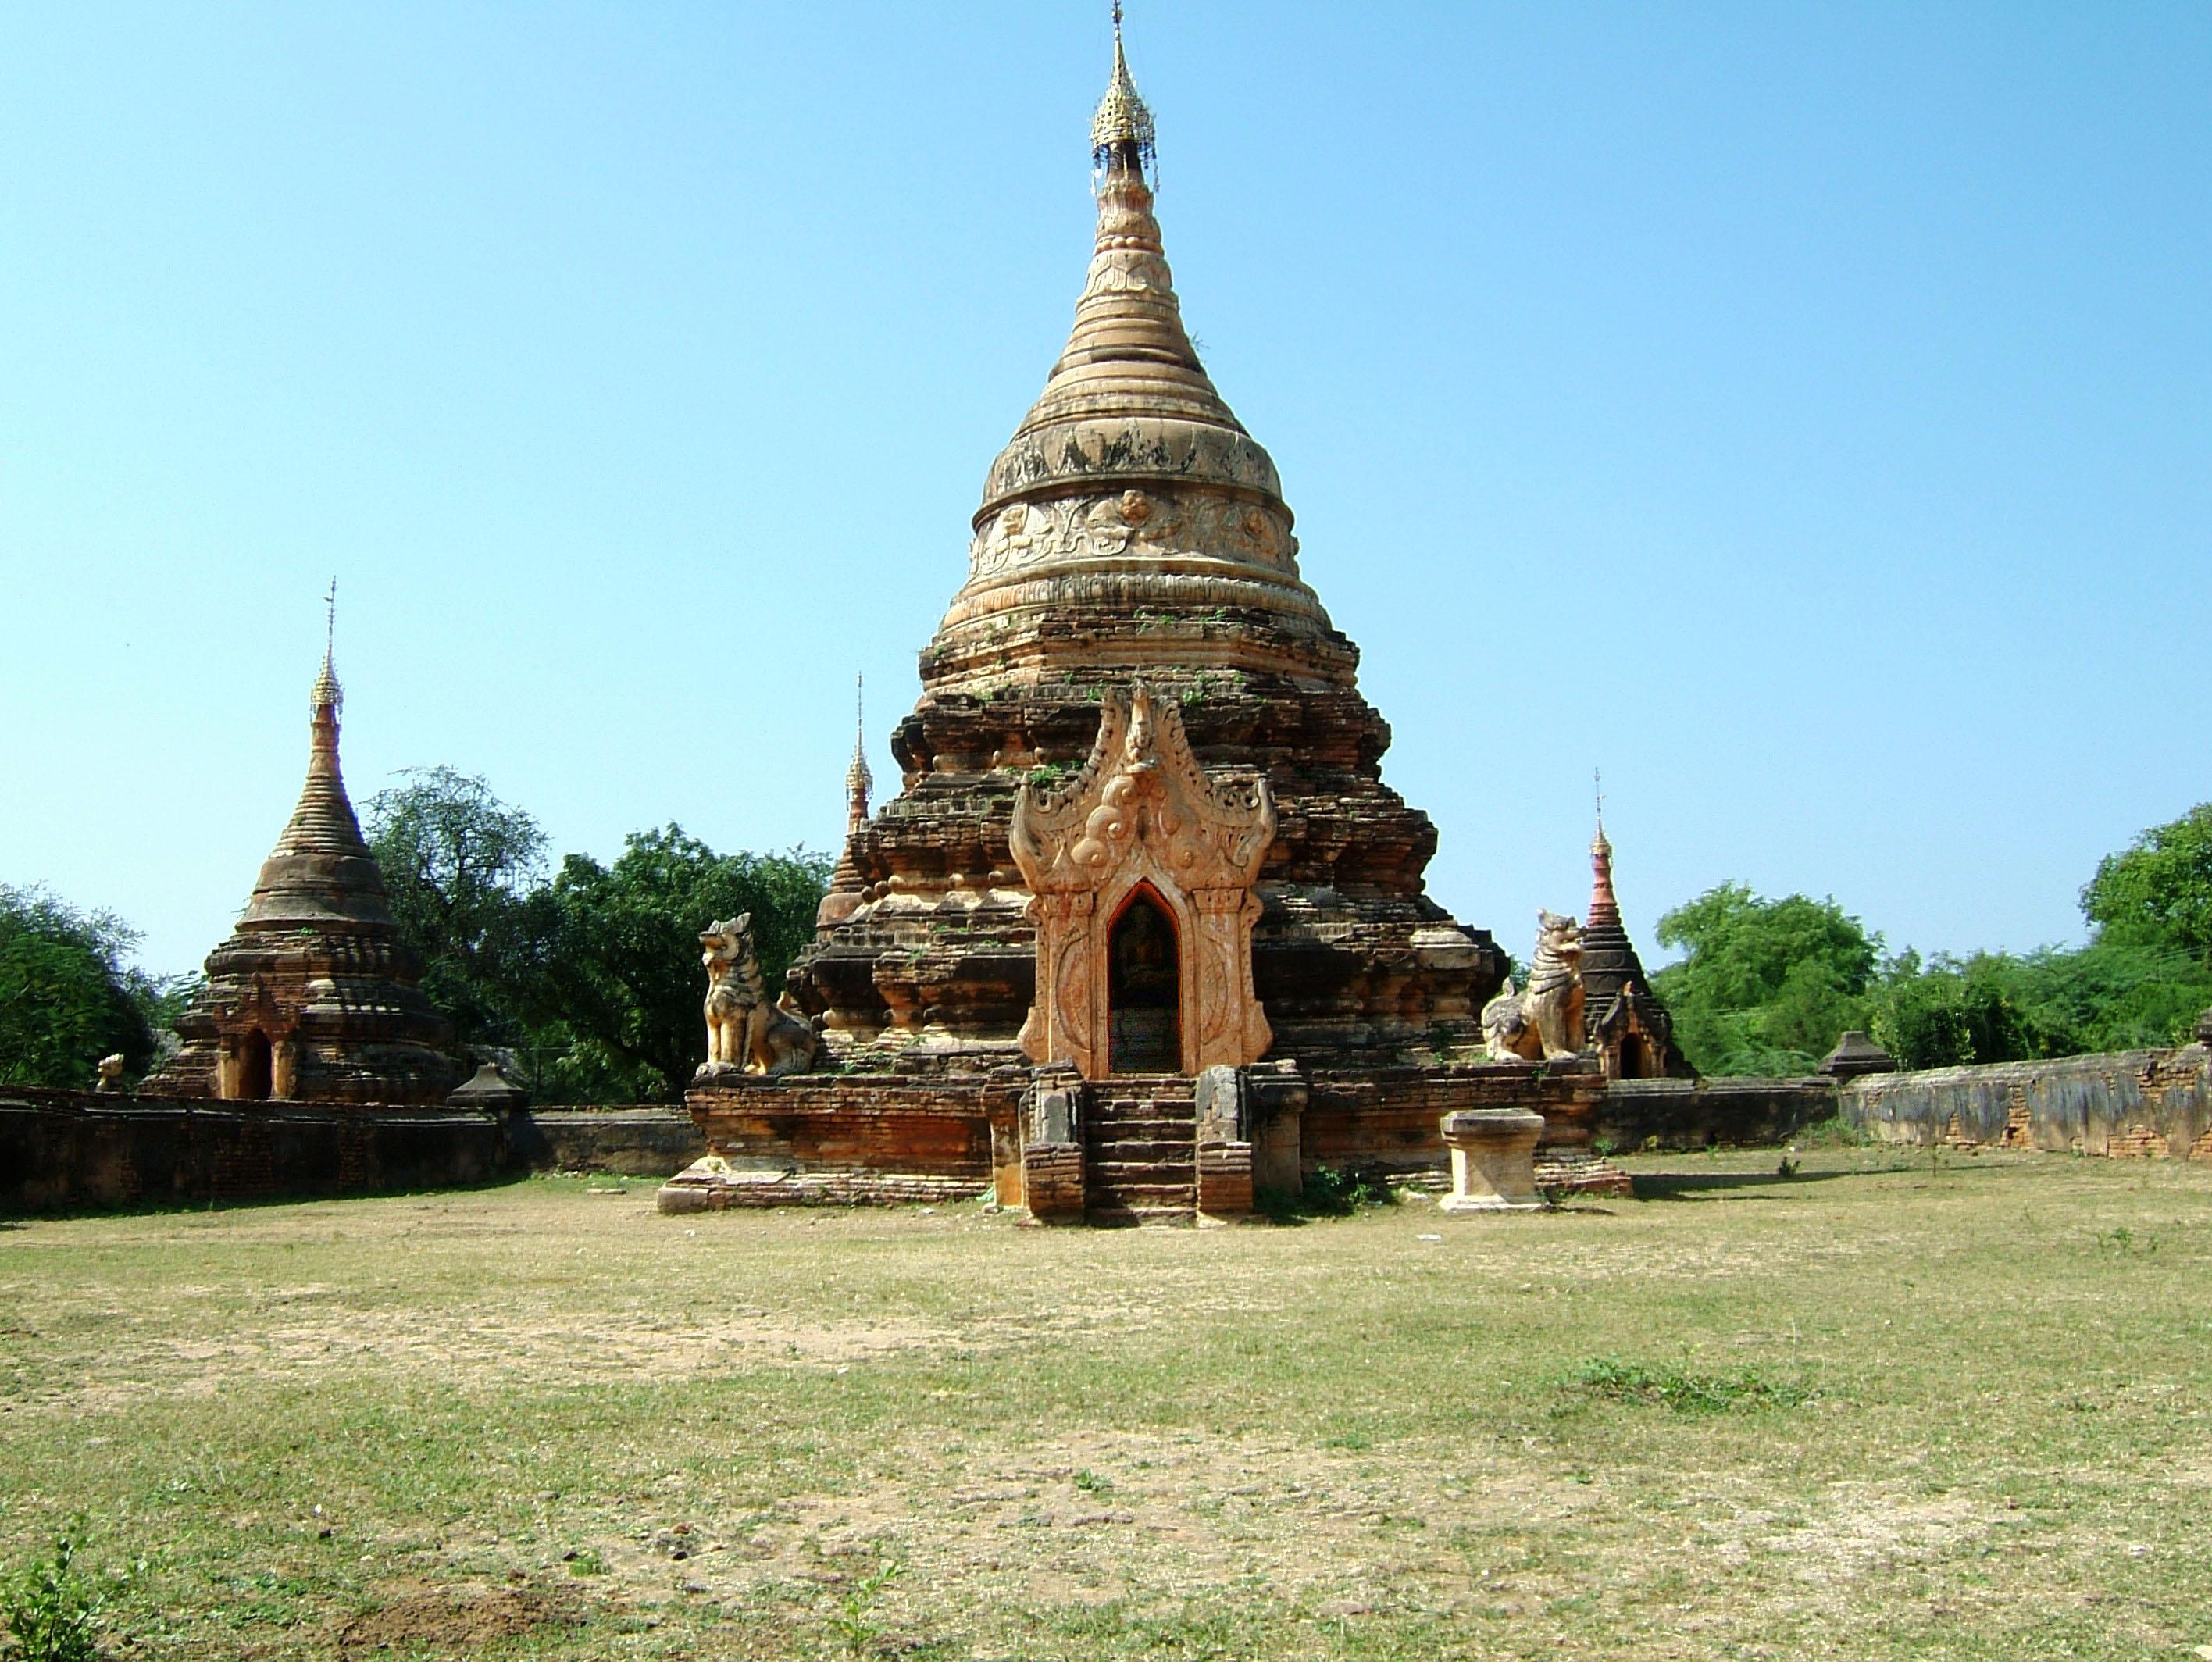 Myanmar Sagaing numerous pagodas Nov 2004 03